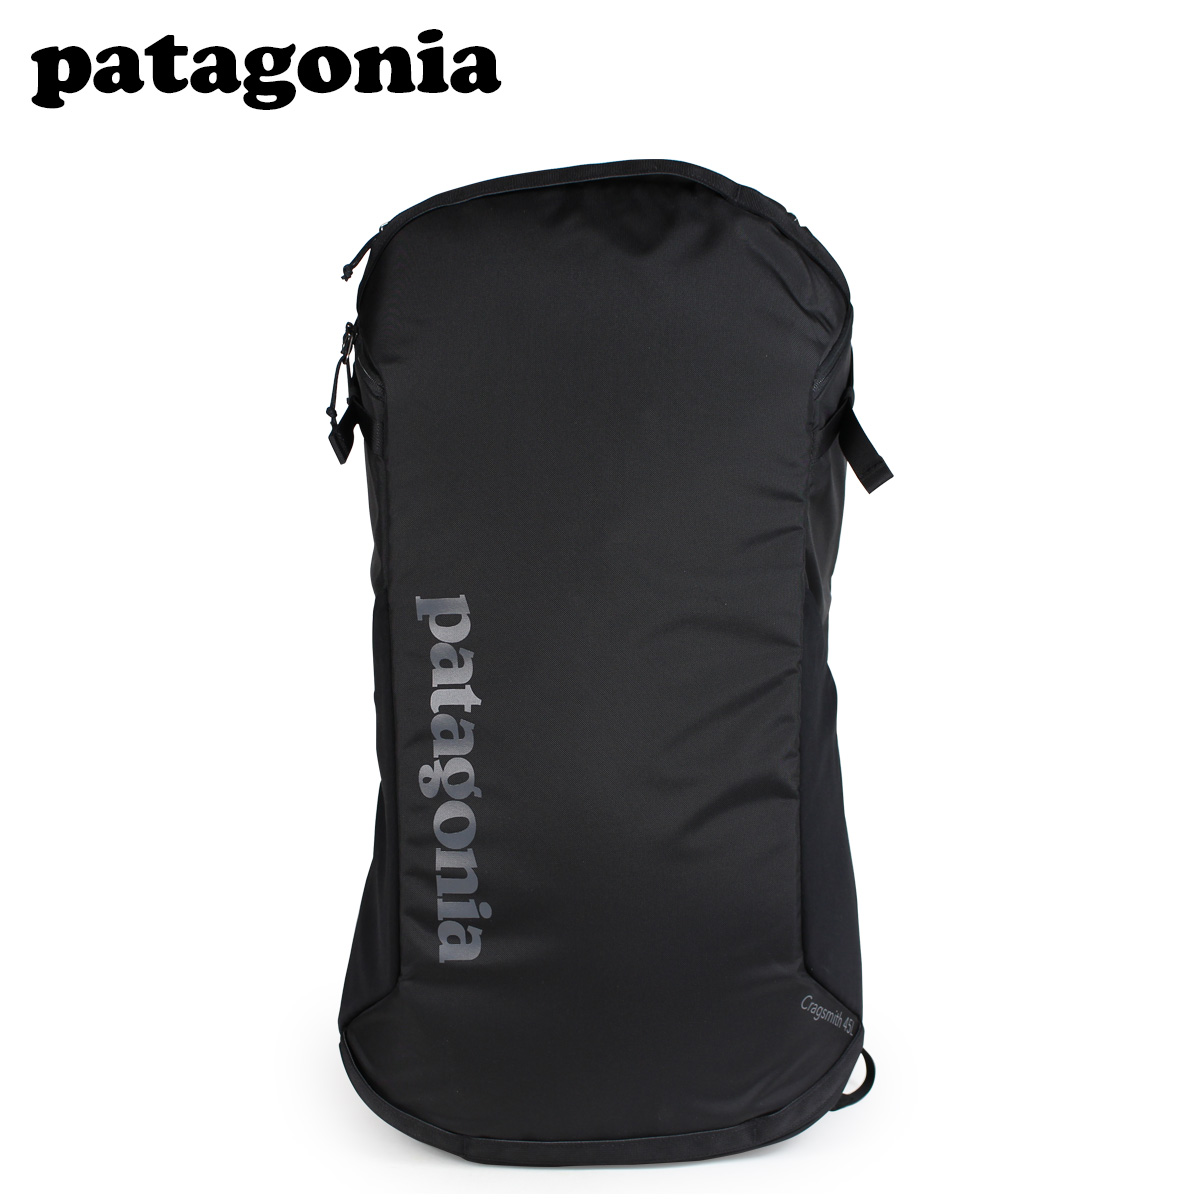 patagonia パタゴニア リュック バックパック 45L CRAGSMITH メンズ レディース ブラック 48065 [10/5 新入荷]